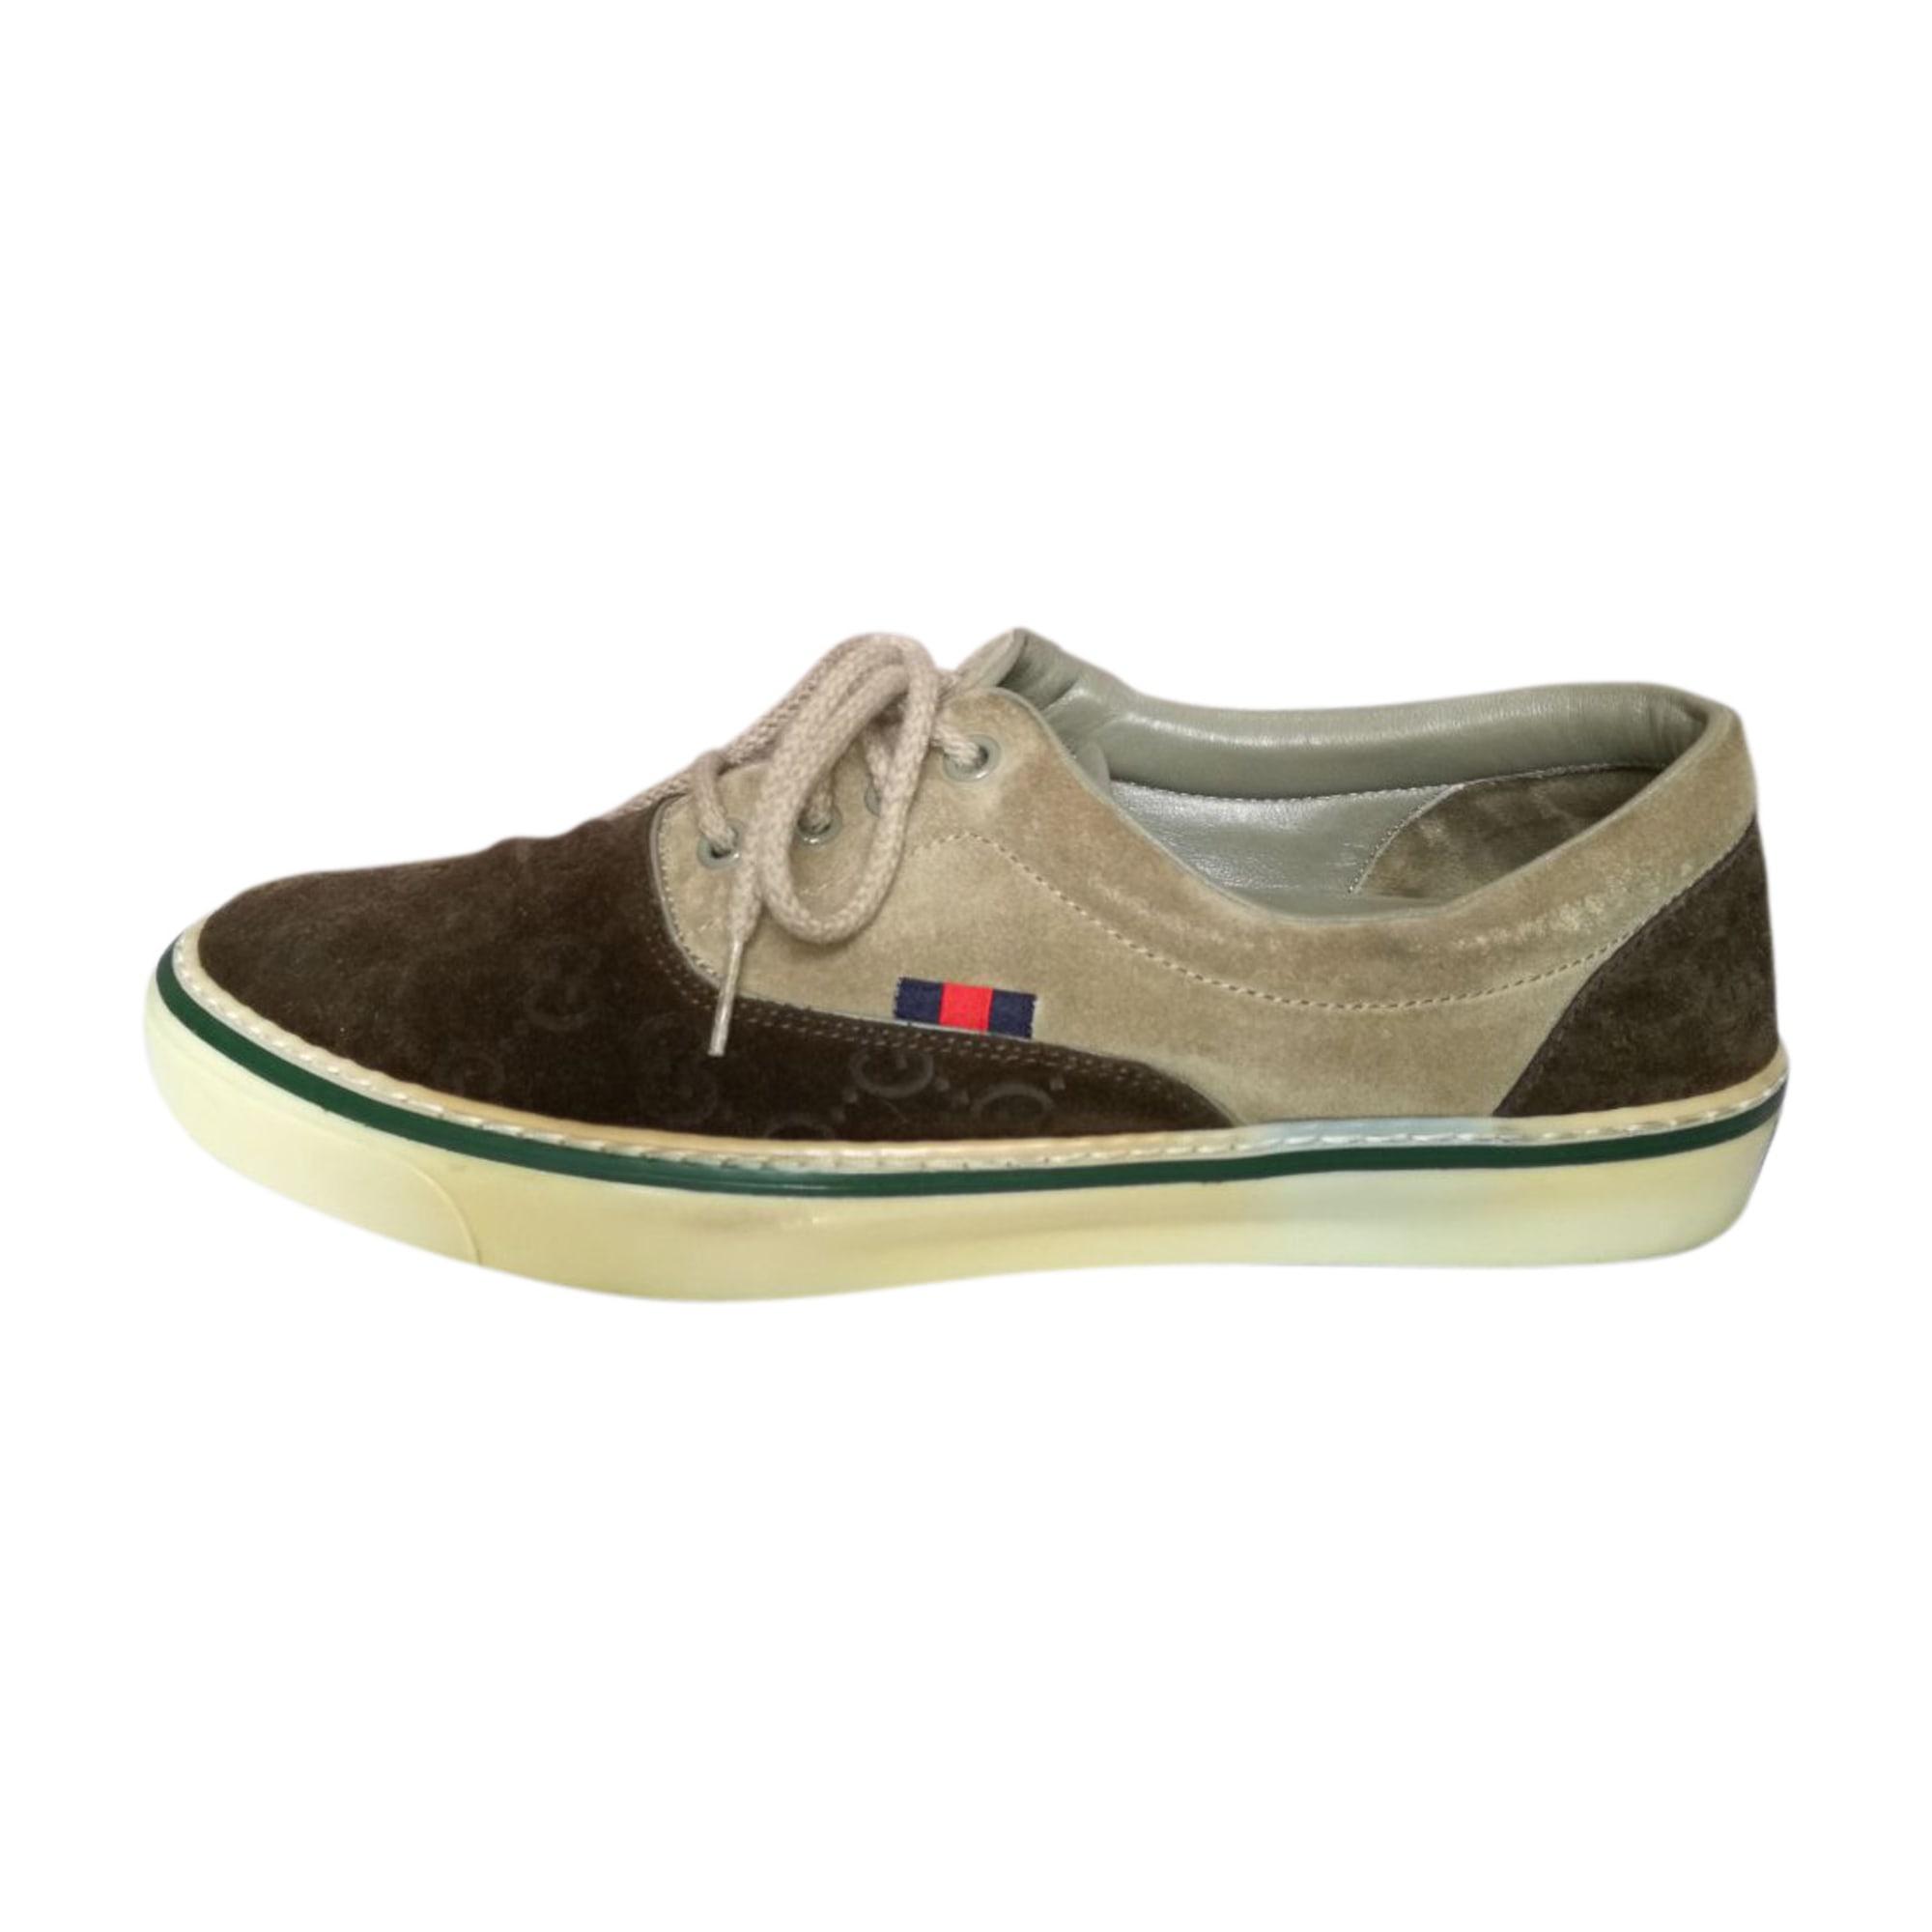 2269d7986f6 Chaussures de sport GUCCI 40 marron - 8645561